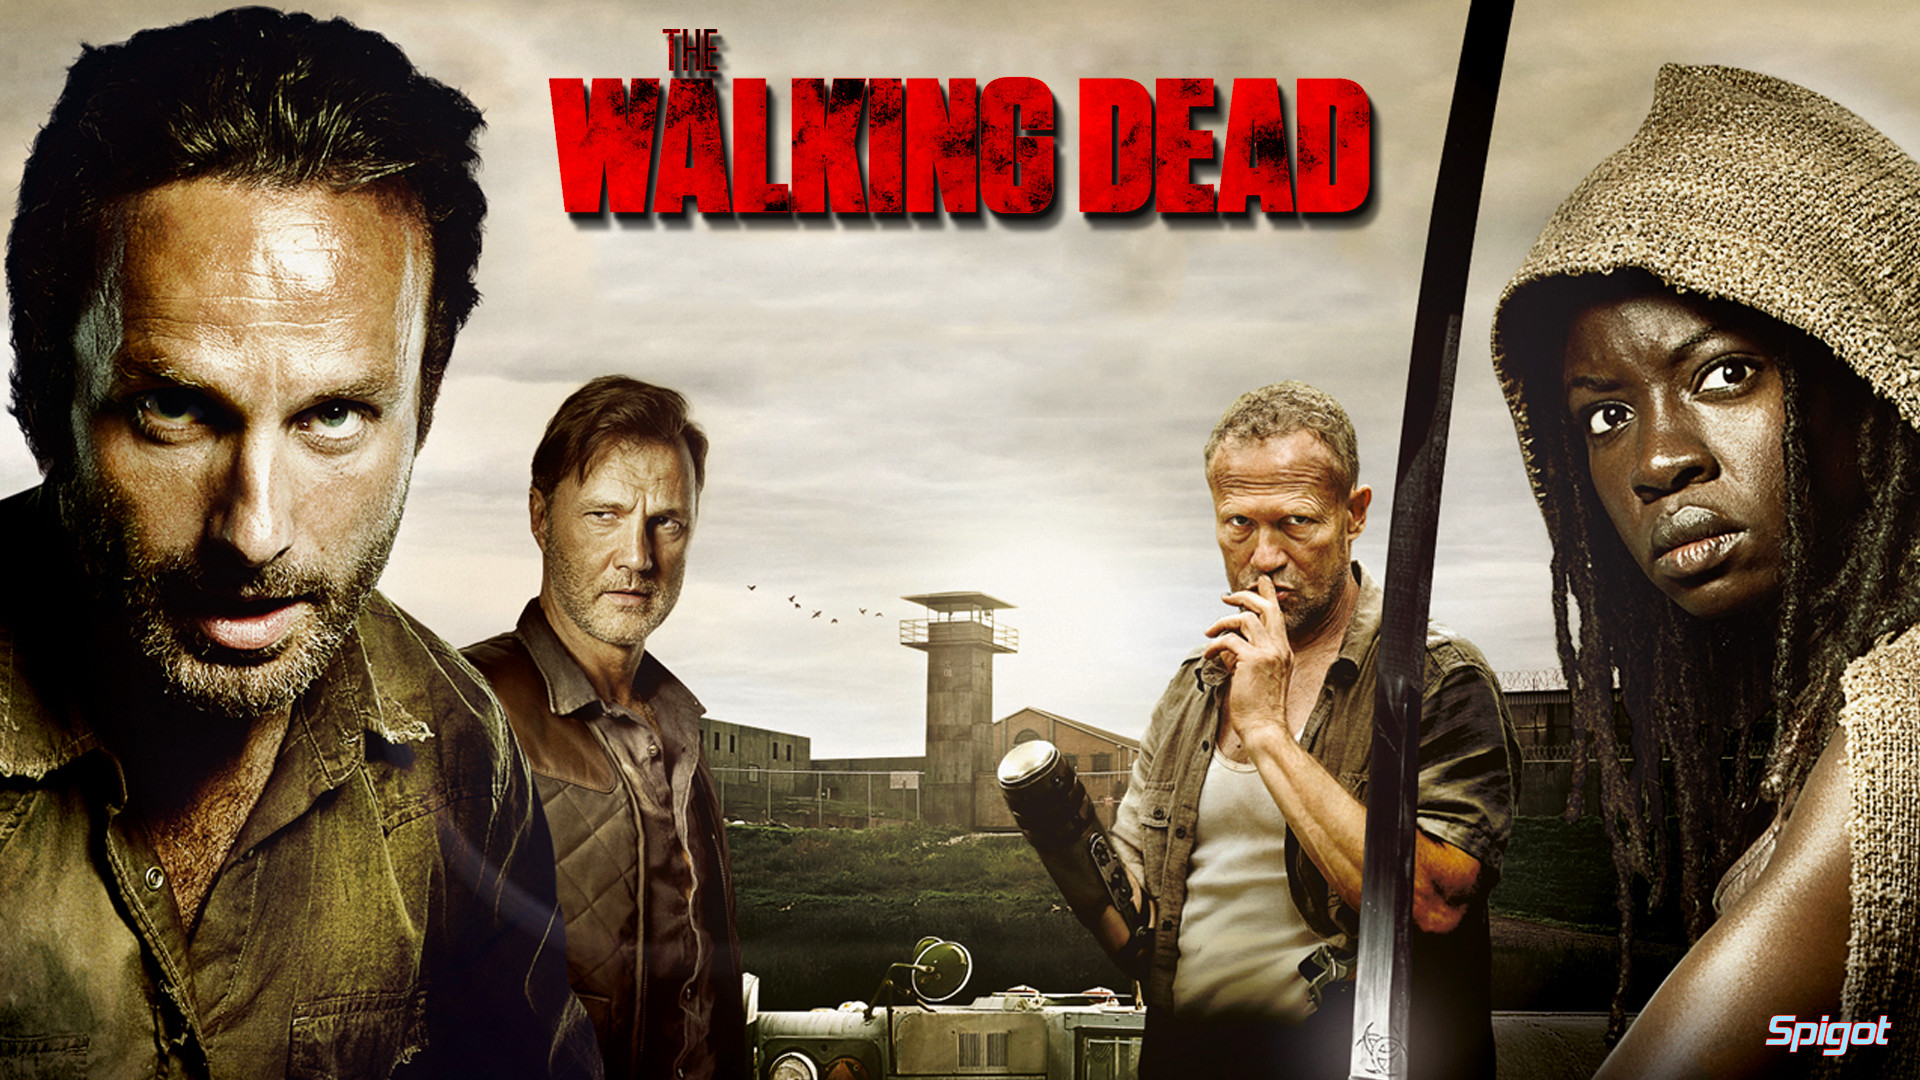 The Walking Dead Wallpaper HD 1080p   ImageBank.biz